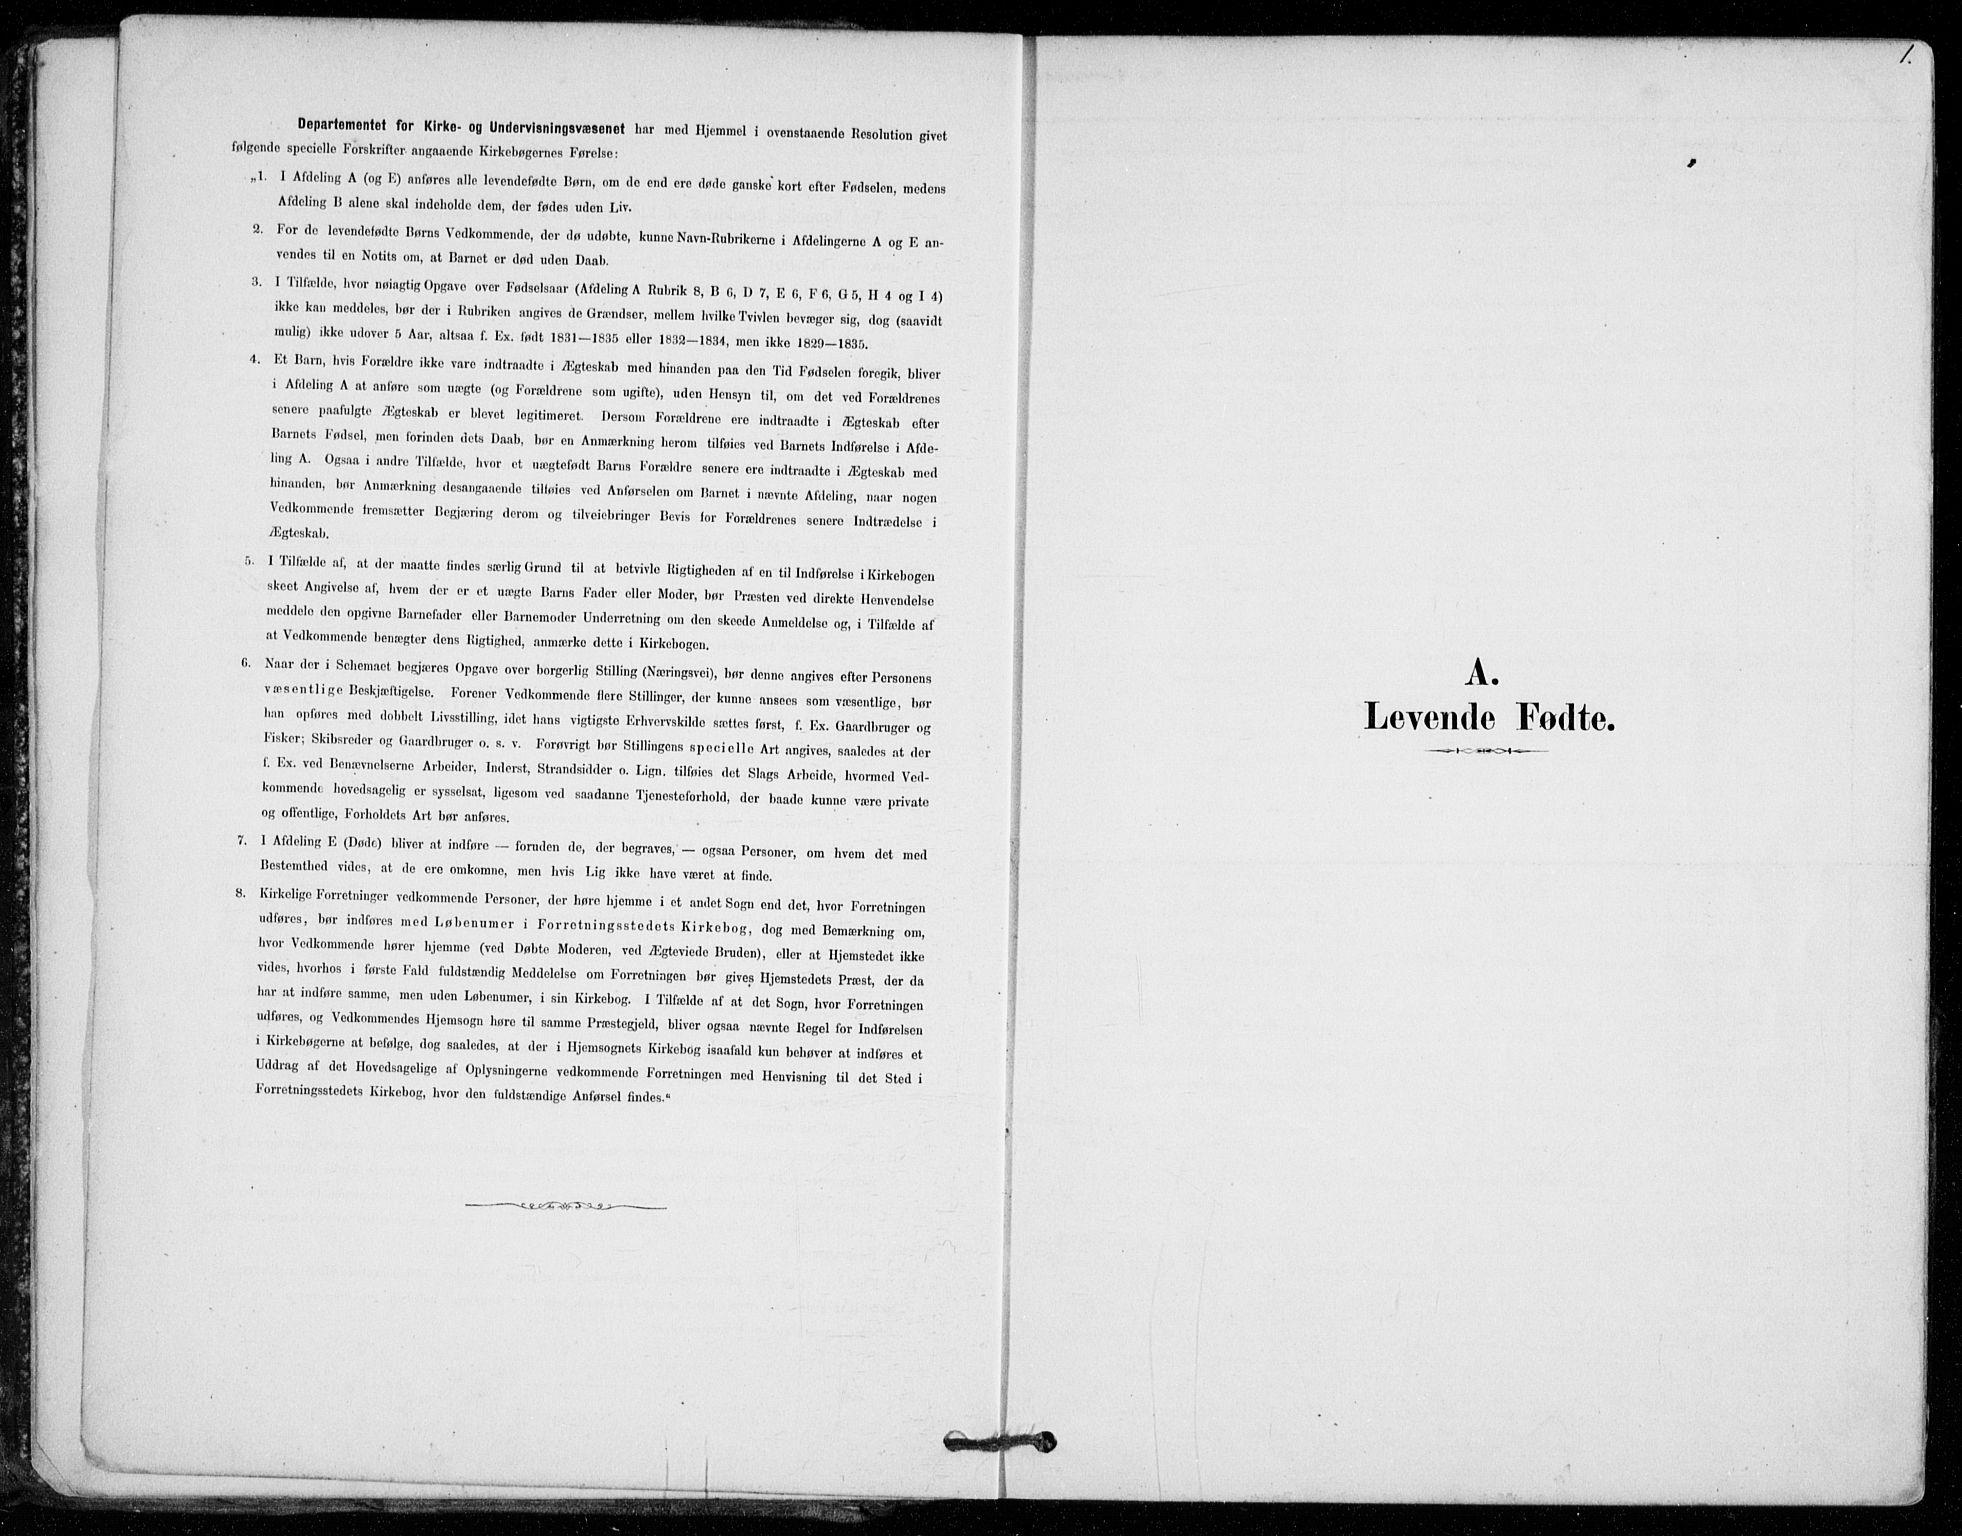 SAO, Vestby prestekontor Kirkebøker, F/Fe/L0001: Ministerialbok nr. V 1, 1878-1931, s. 1